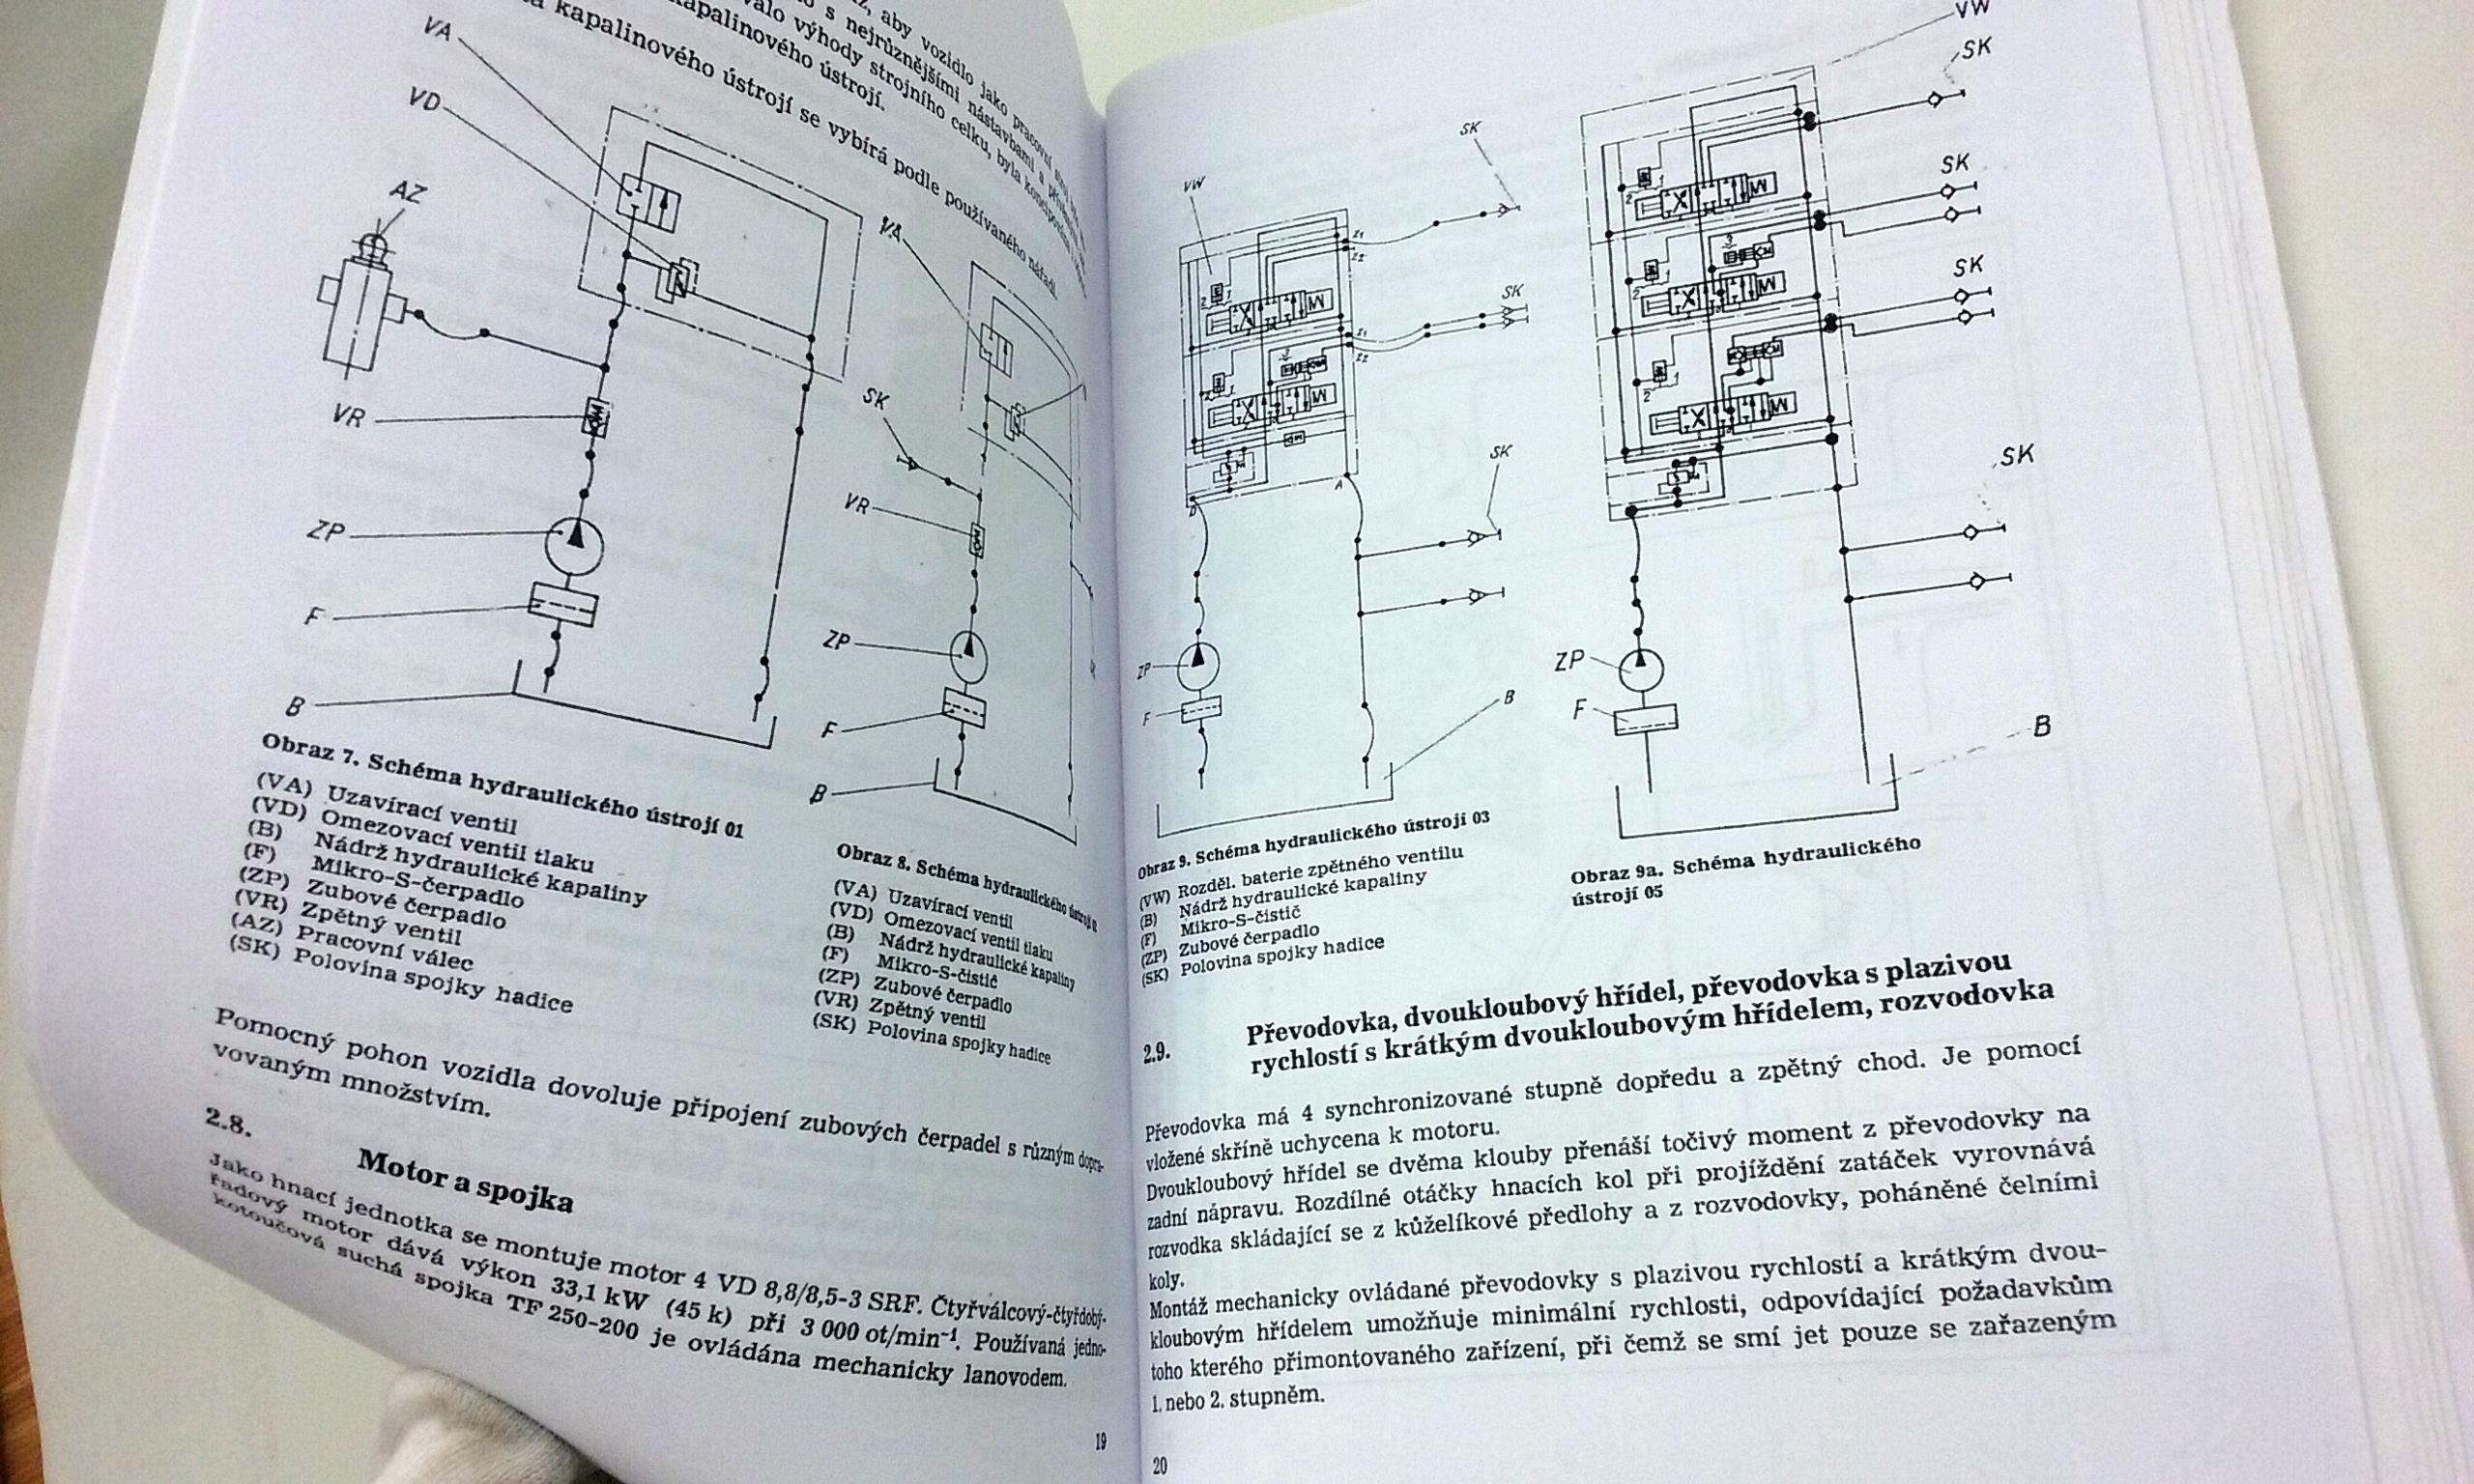 PORTABLE Multicar M25 Manuall CD0485-300-7